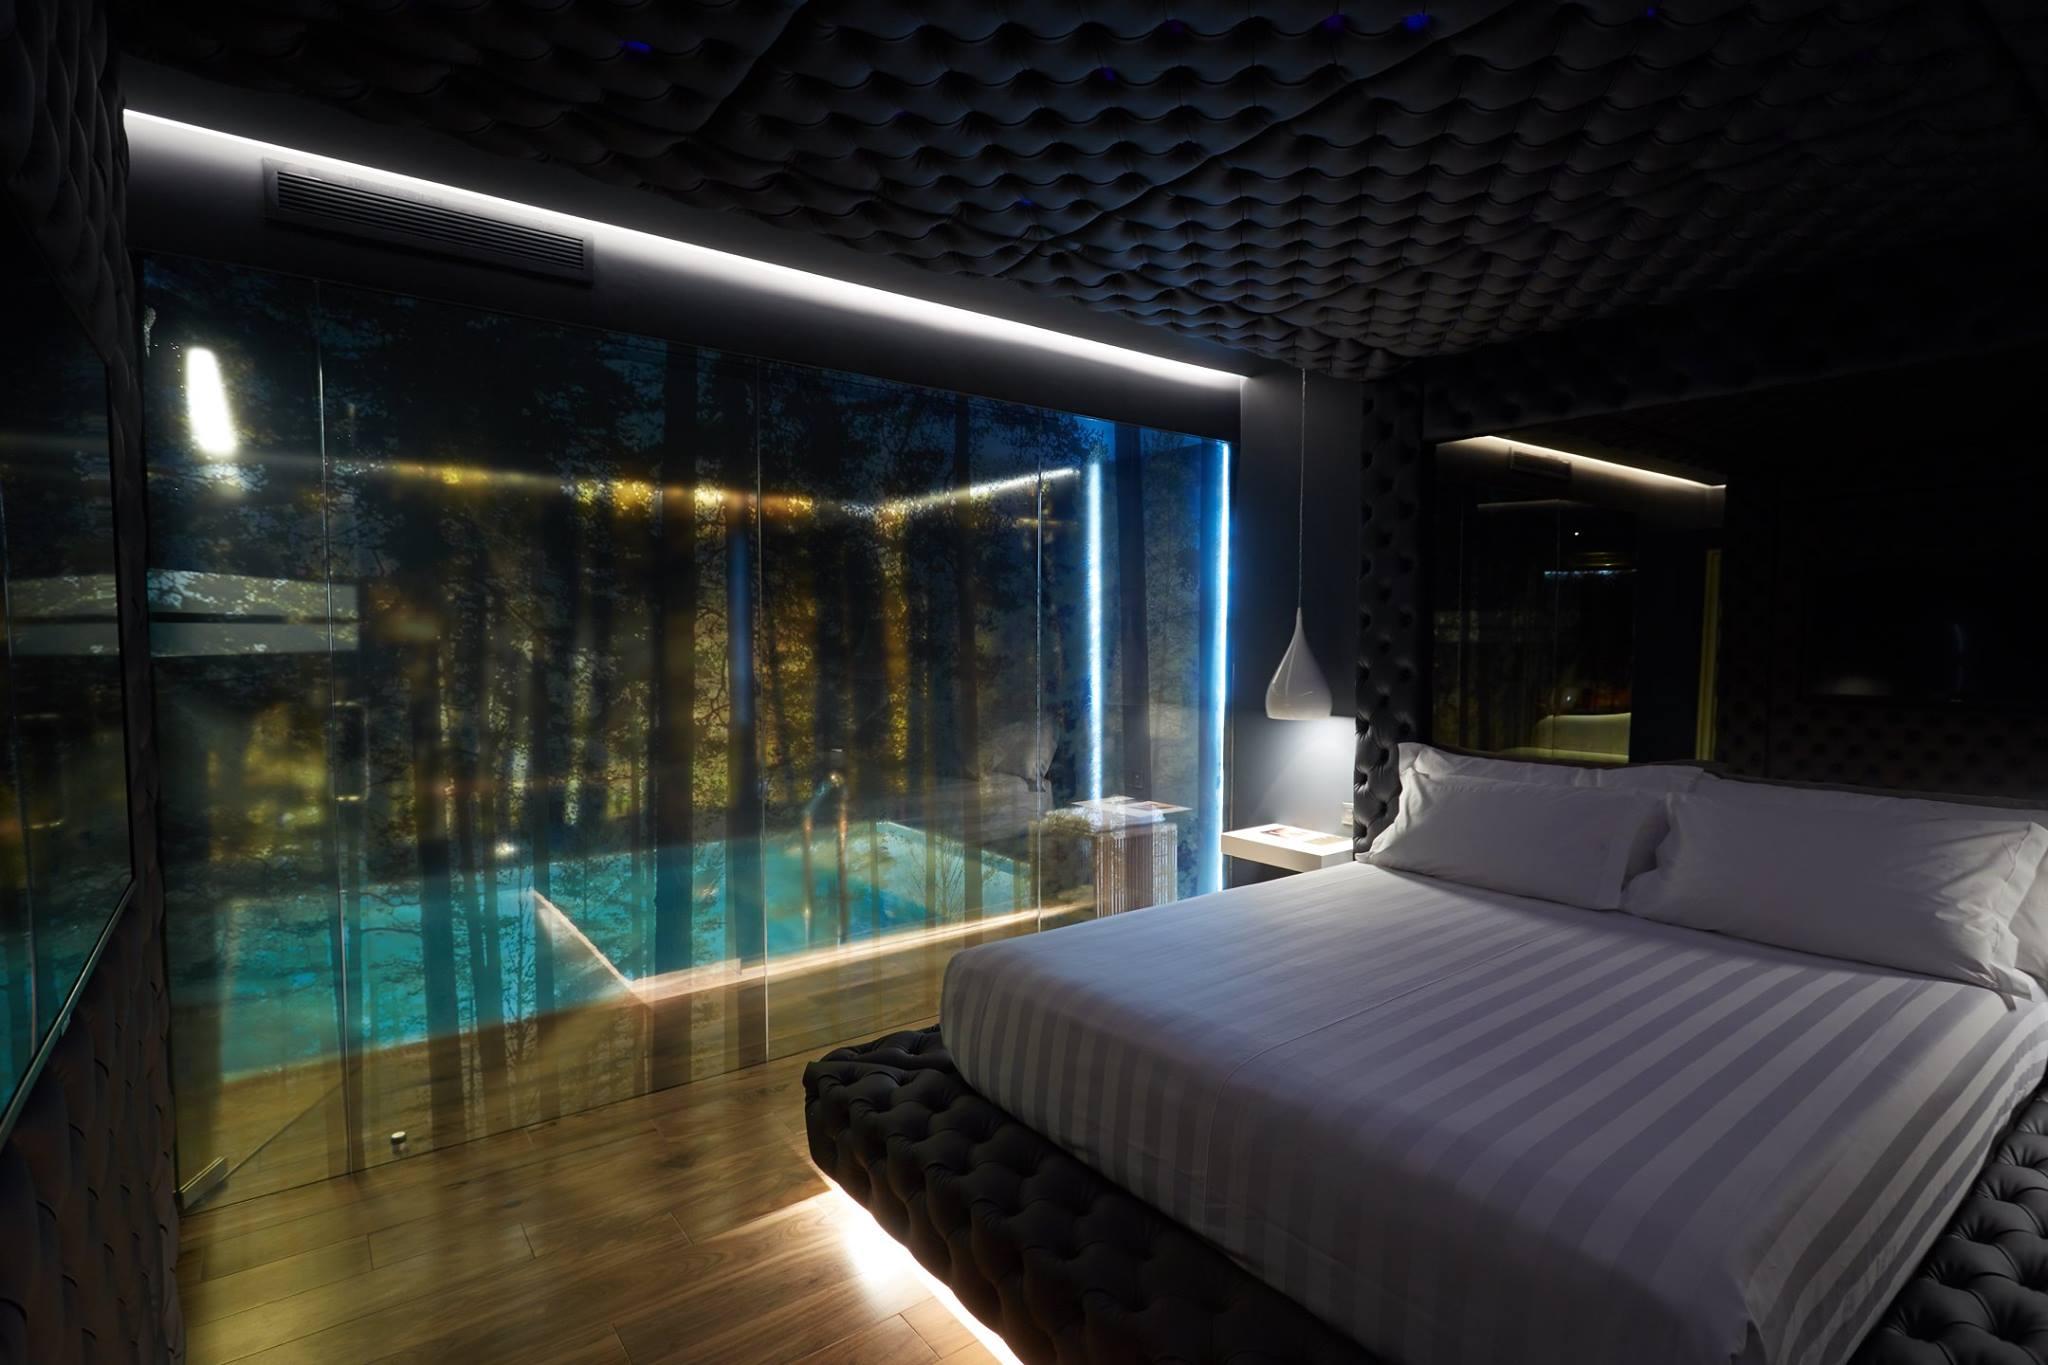 Suite Natura avec piscine - Habana Motel - Matosinhos - Porto